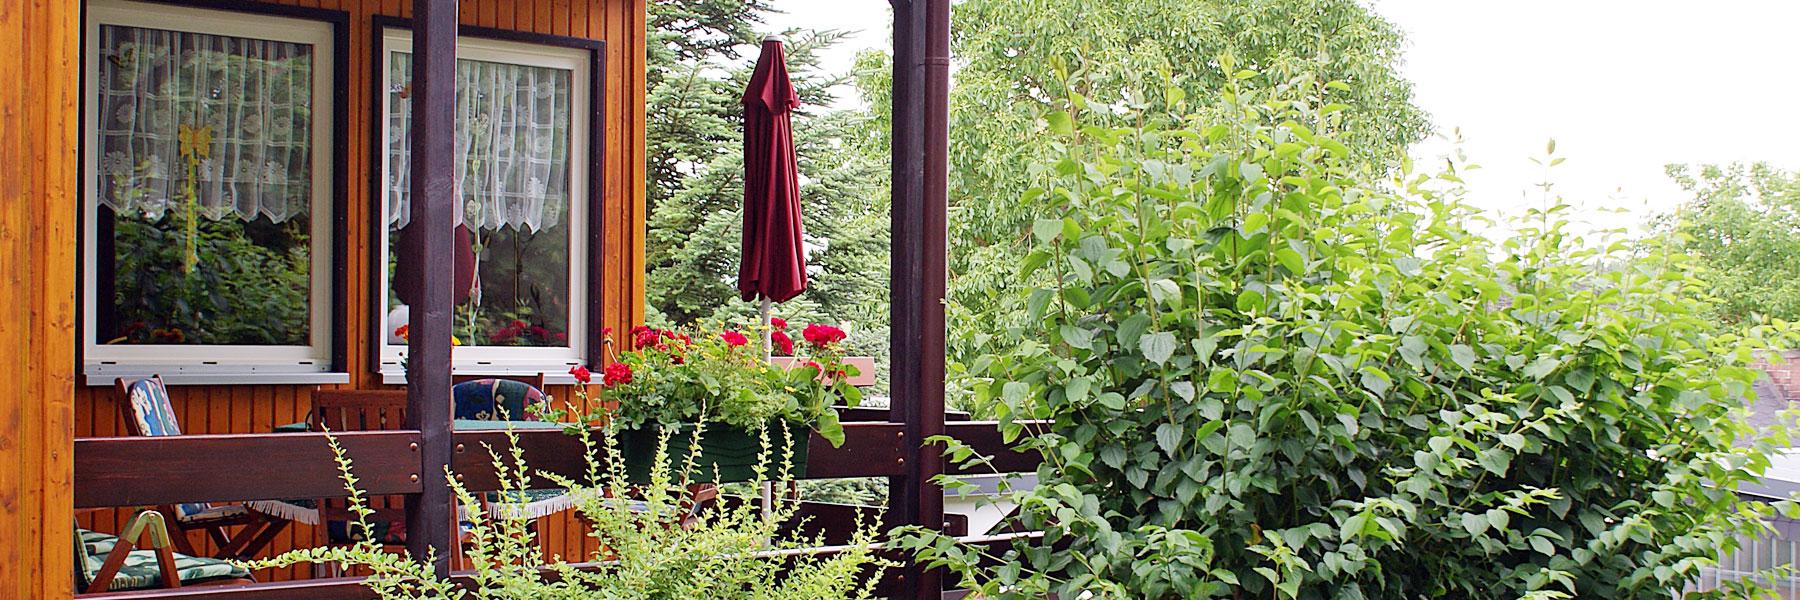 Terrasse - Ferienhaus Familie Hauß